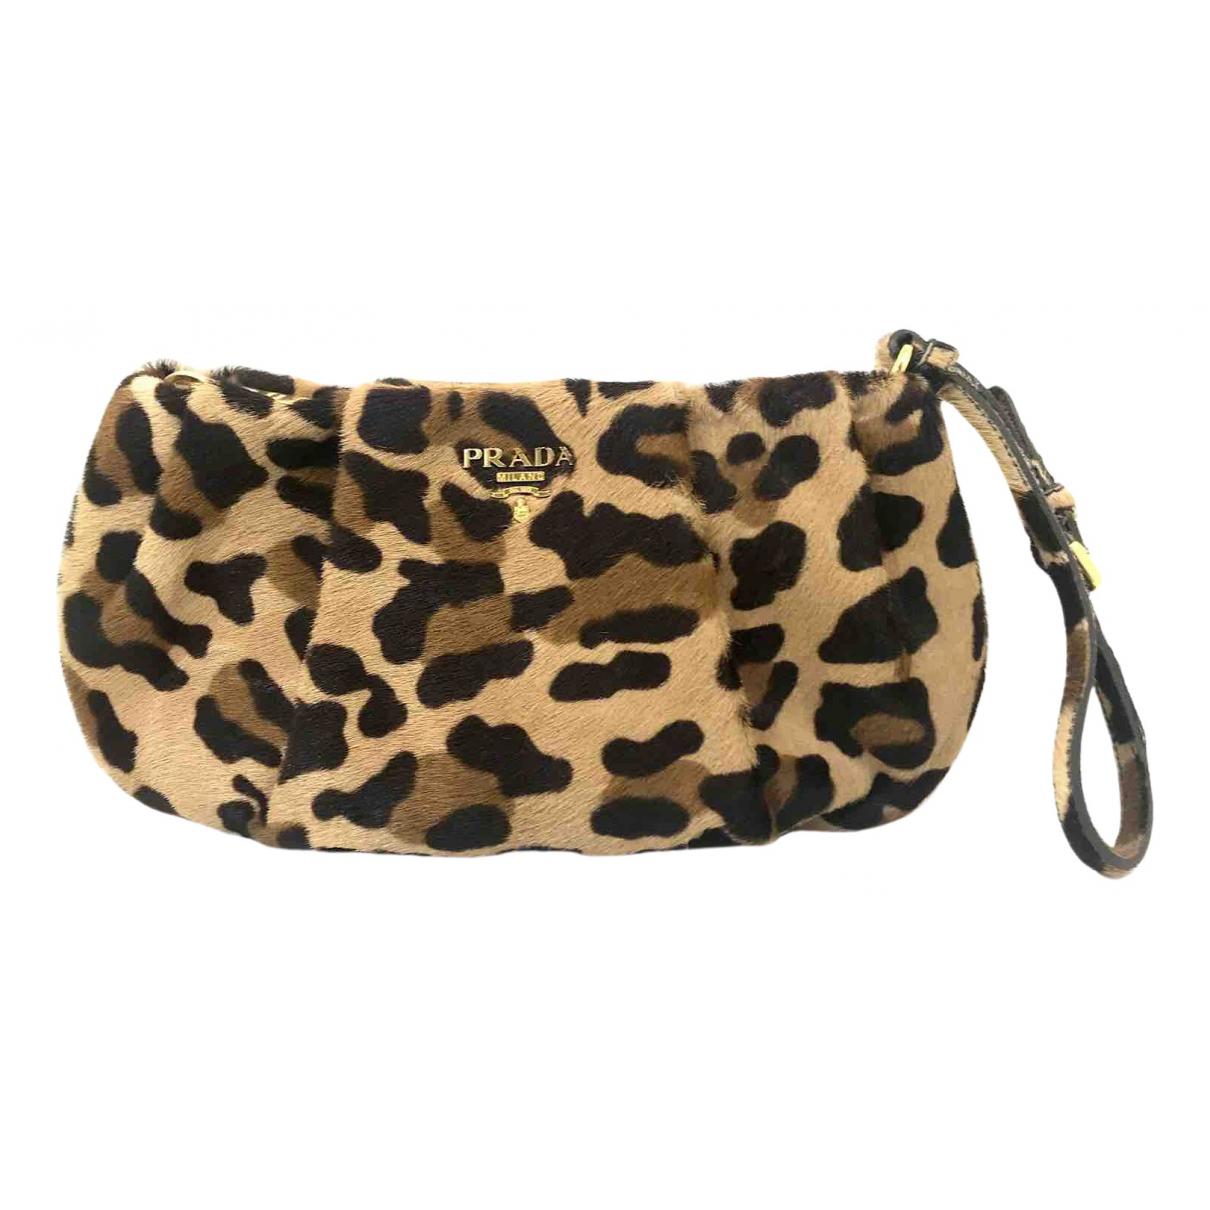 Prada \N Multicolour Pony-style calfskin Clutch bag for Women \N